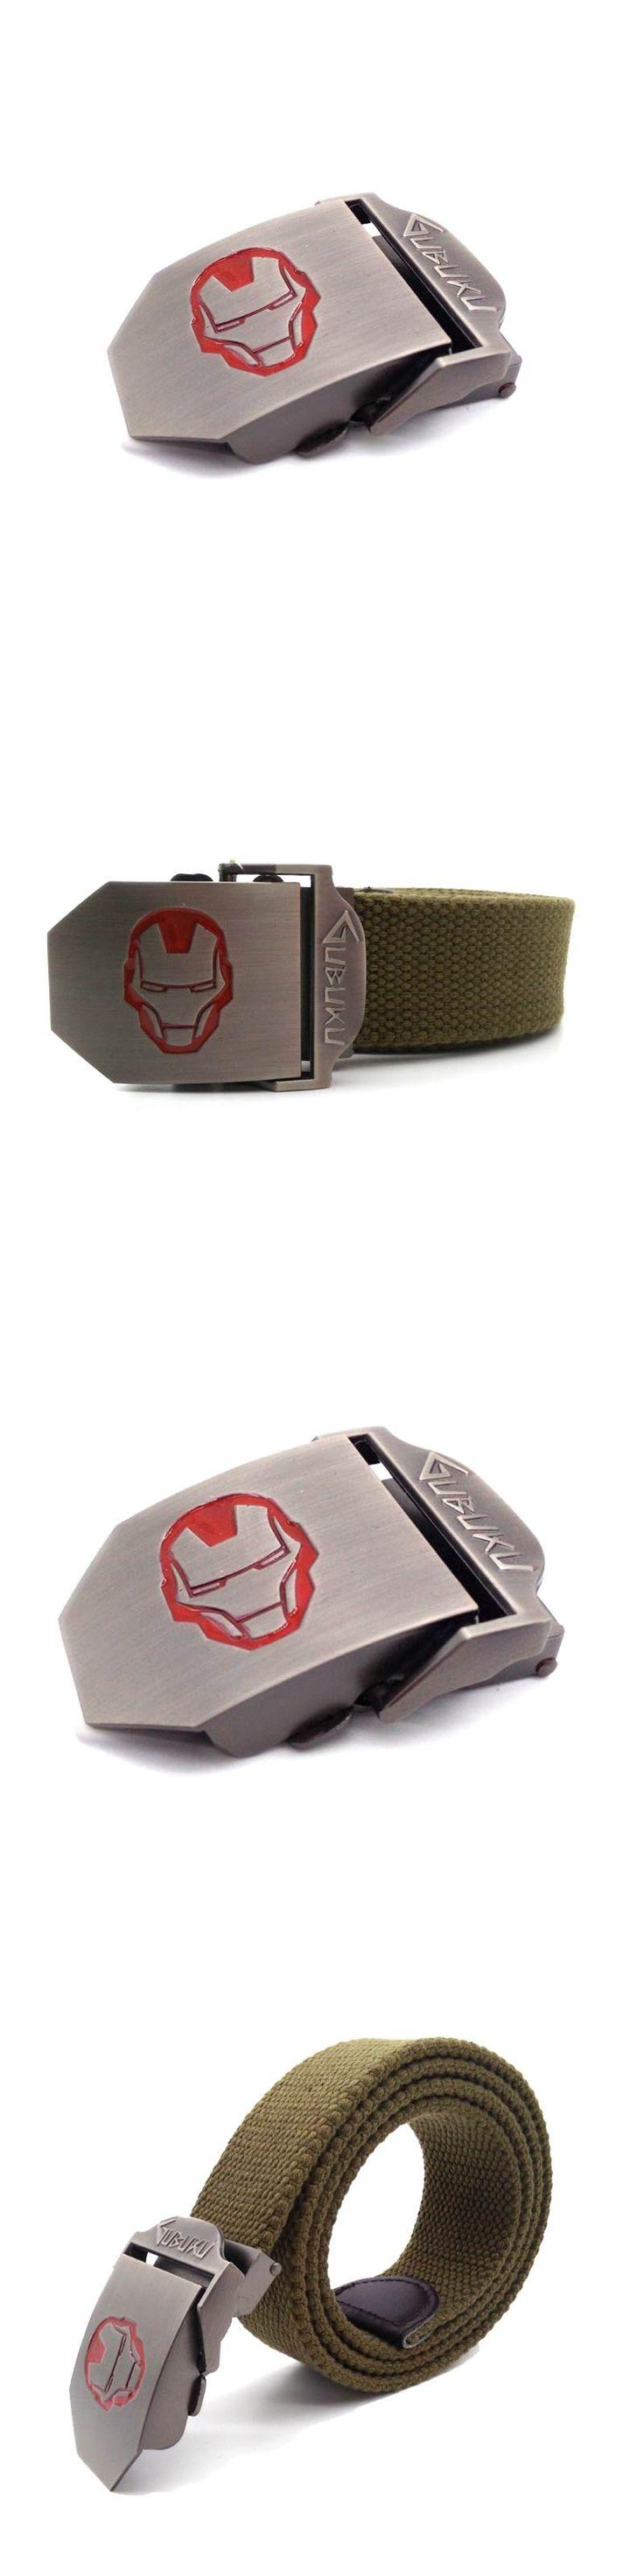 winter canvas belt for men jean belts for men military male strap classic belts green 130 cm free shipping